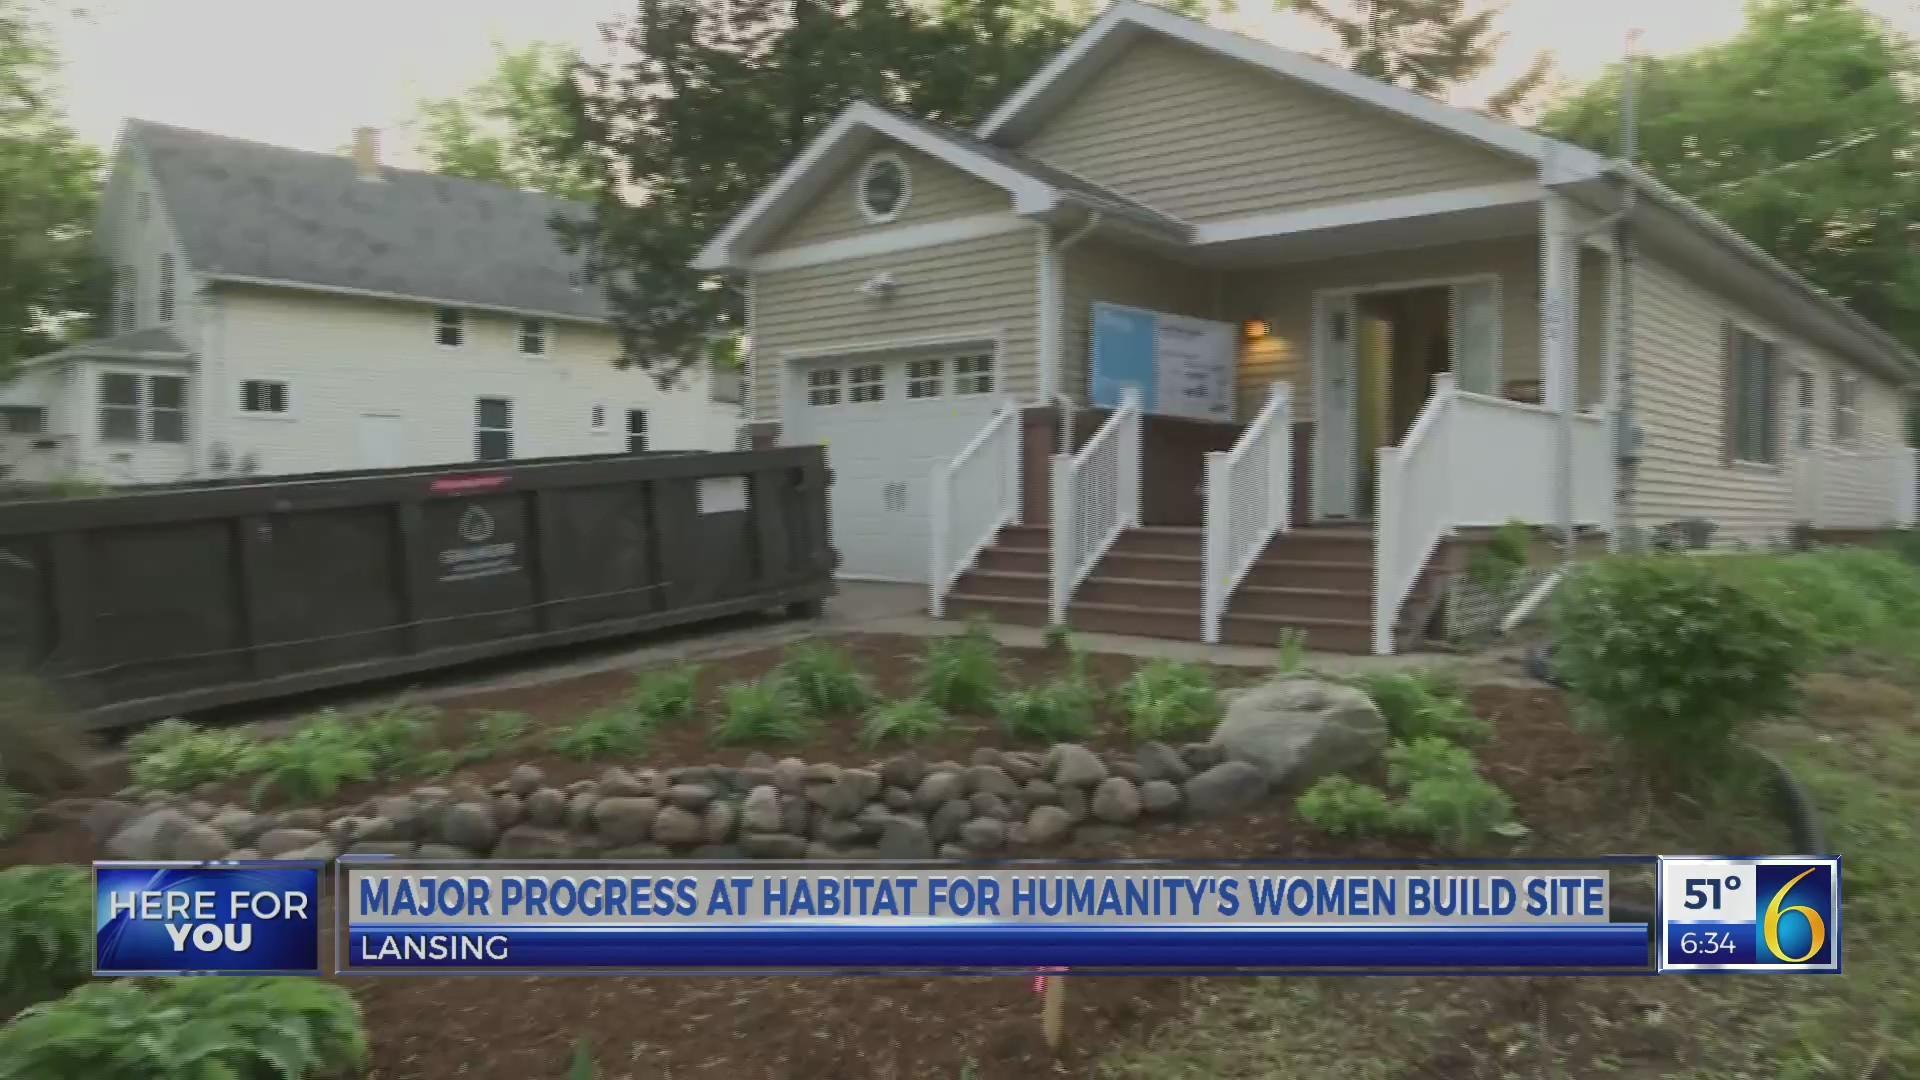 This Morning: Major progress at Habitat for Humanity's women build - live 2